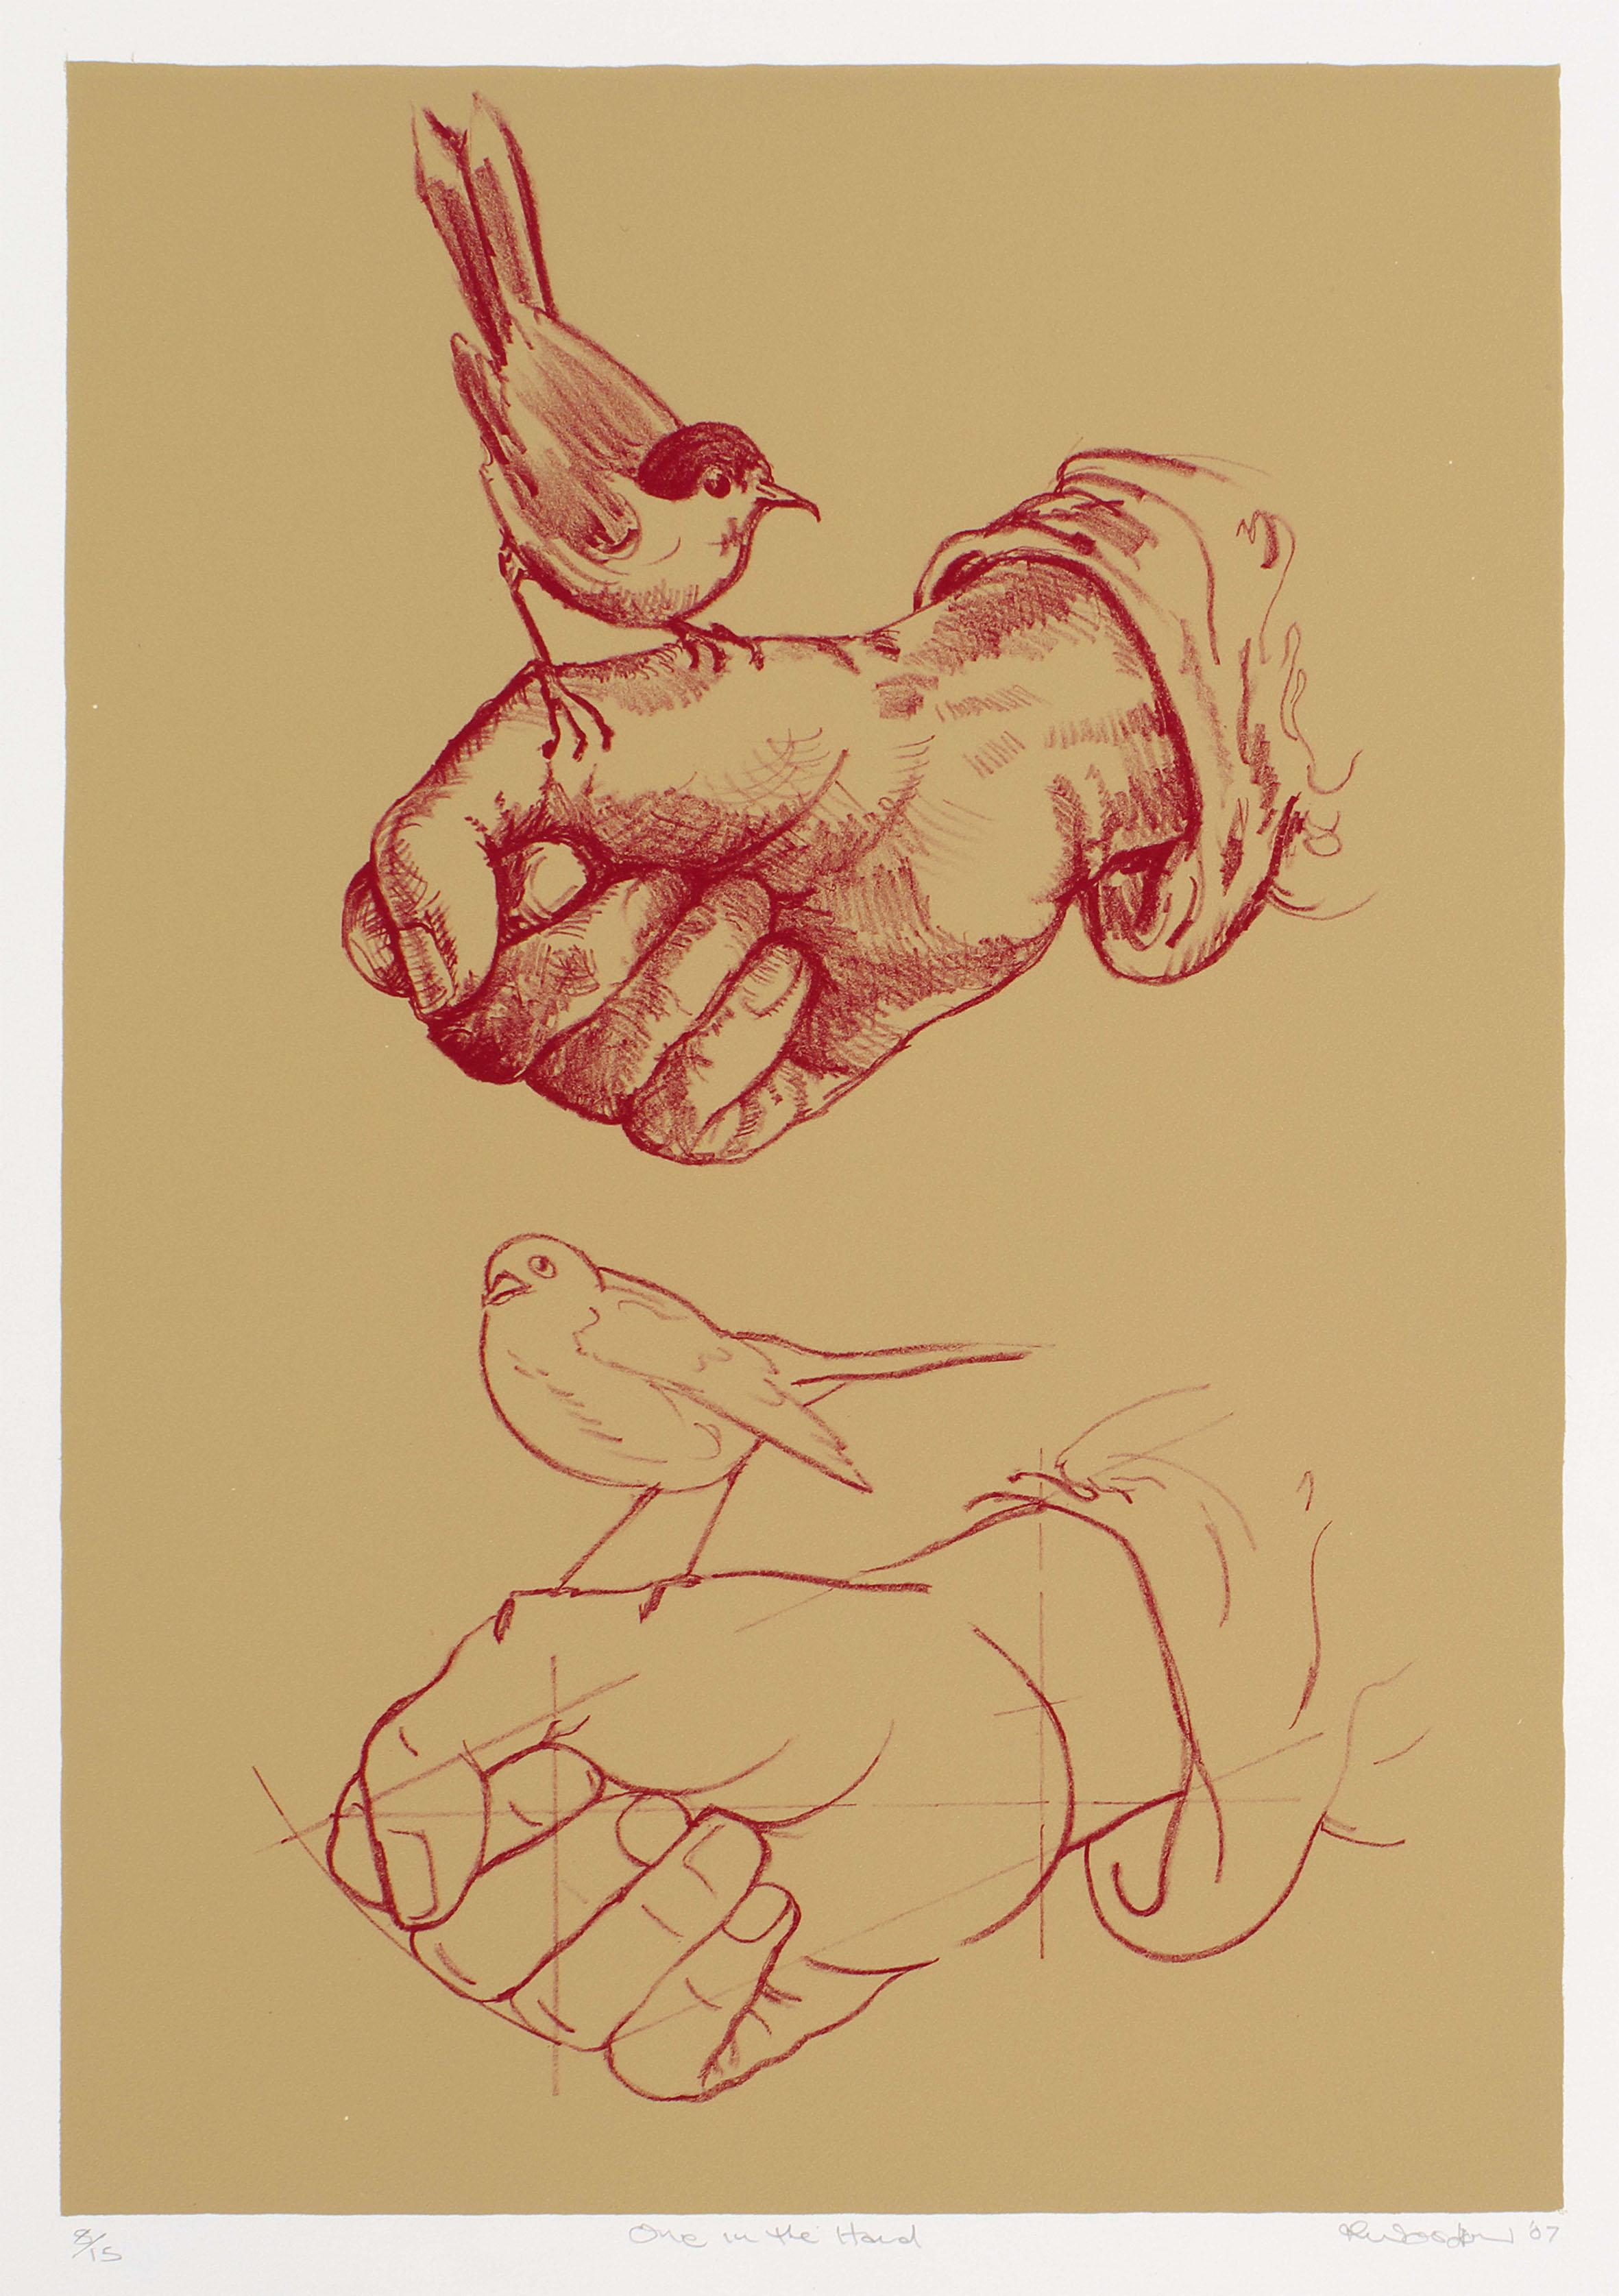 One in the Hand   lithograph (Printer, Satoru Itazu, Tokyo) 415 x 280 mm. Edition of 15.